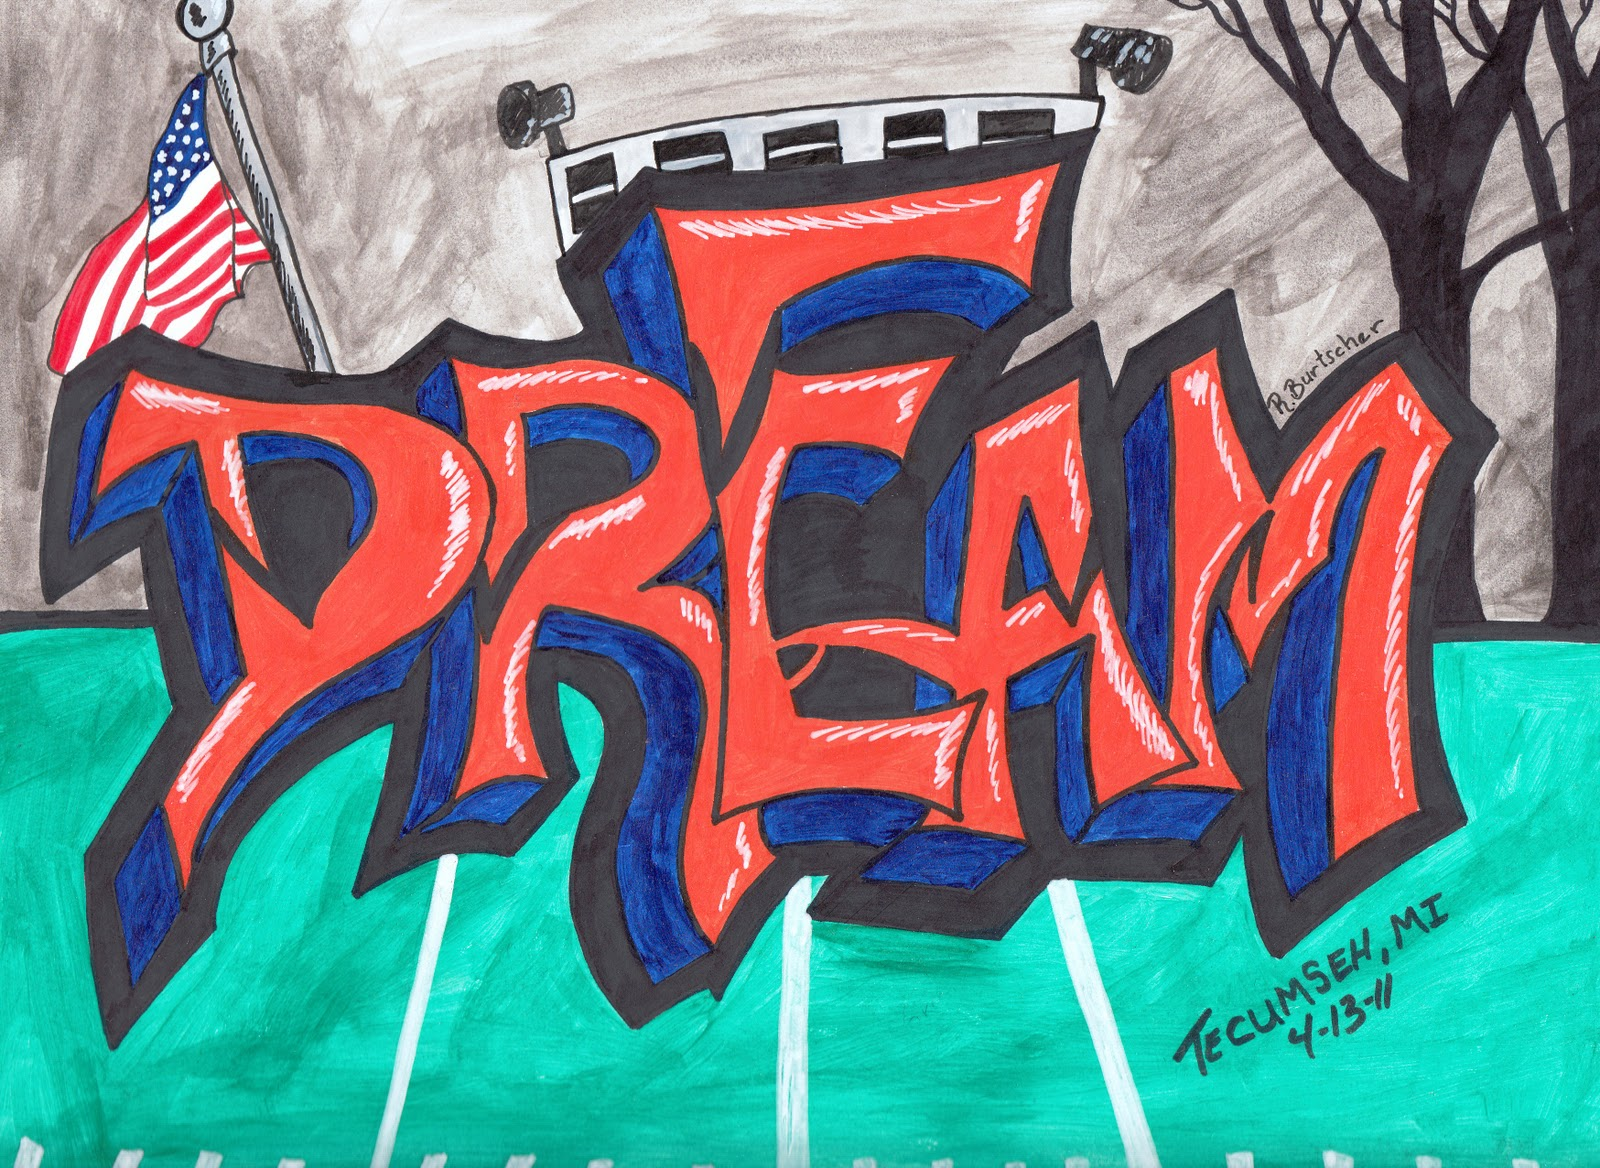 Drawn randome graffiti (older The Spirit: Creative